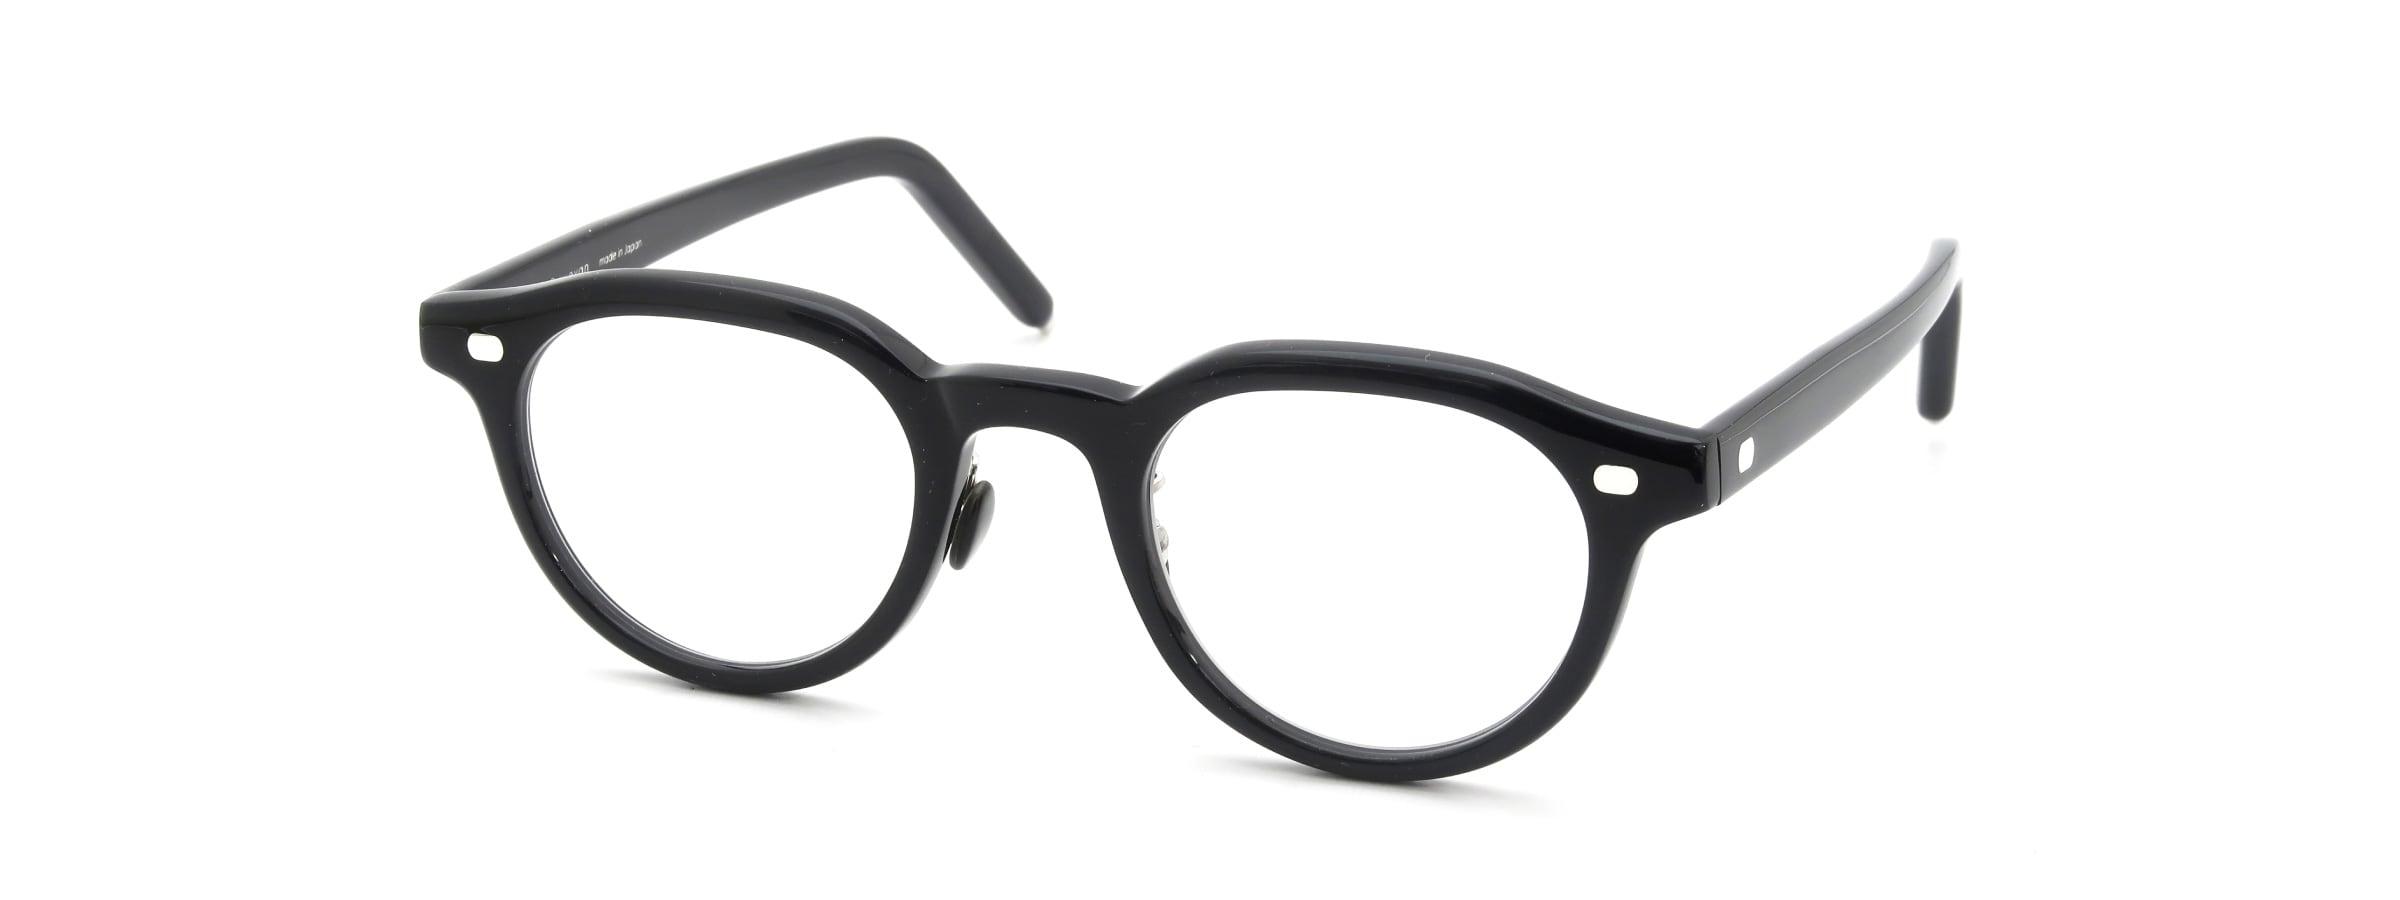 10 eyevan NO.6 Ⅲ FR 46size